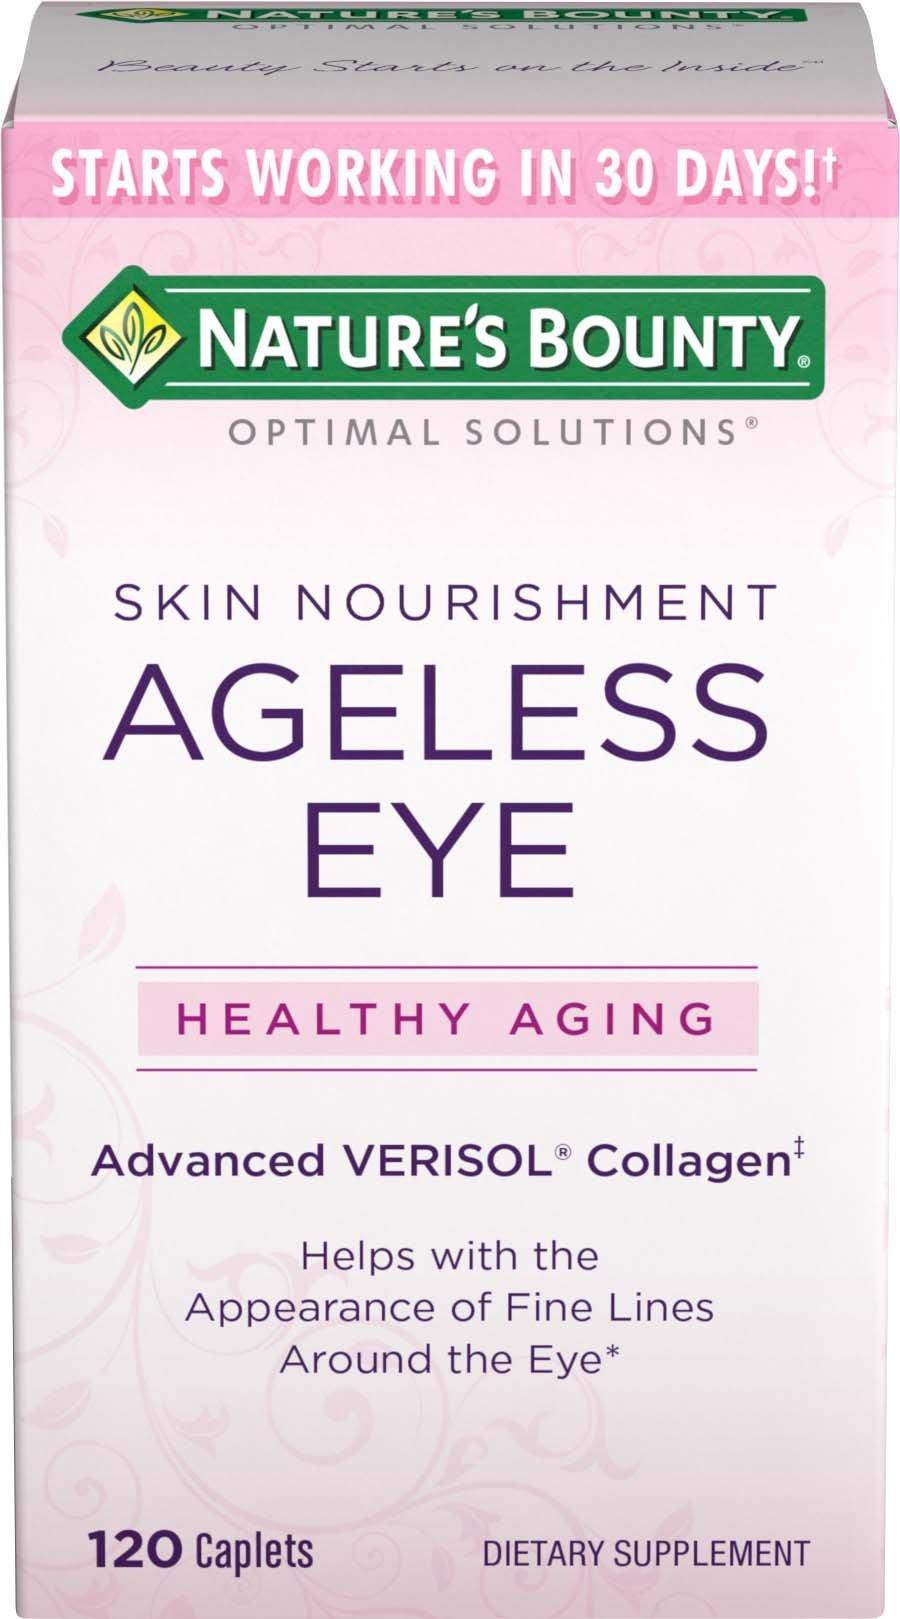 Nature's Bounty Optimal Solutions Ageless Eye Verisol Collagen, 120 Caplets